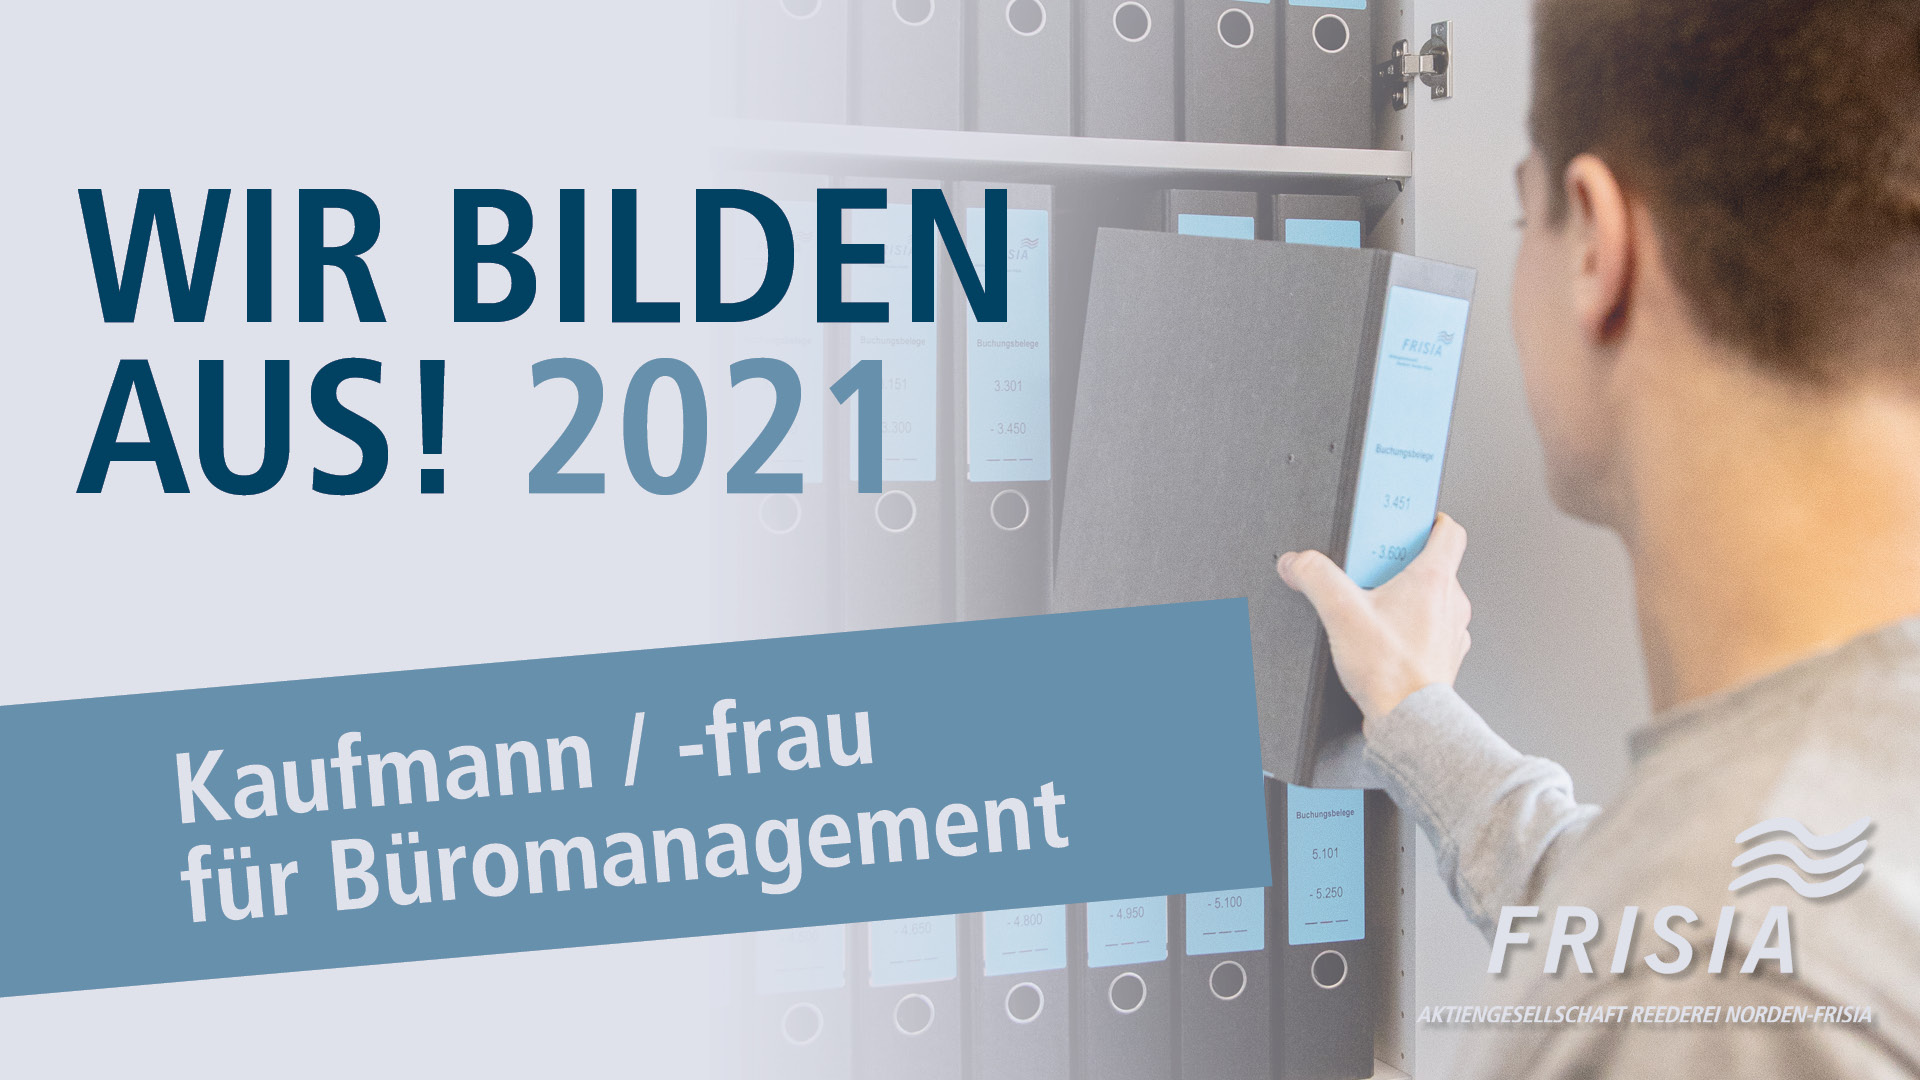 BK 20200929_564b3a305576e4fe419e51512bb2c1d1.jpg – AG Reederei Norden-Frisia